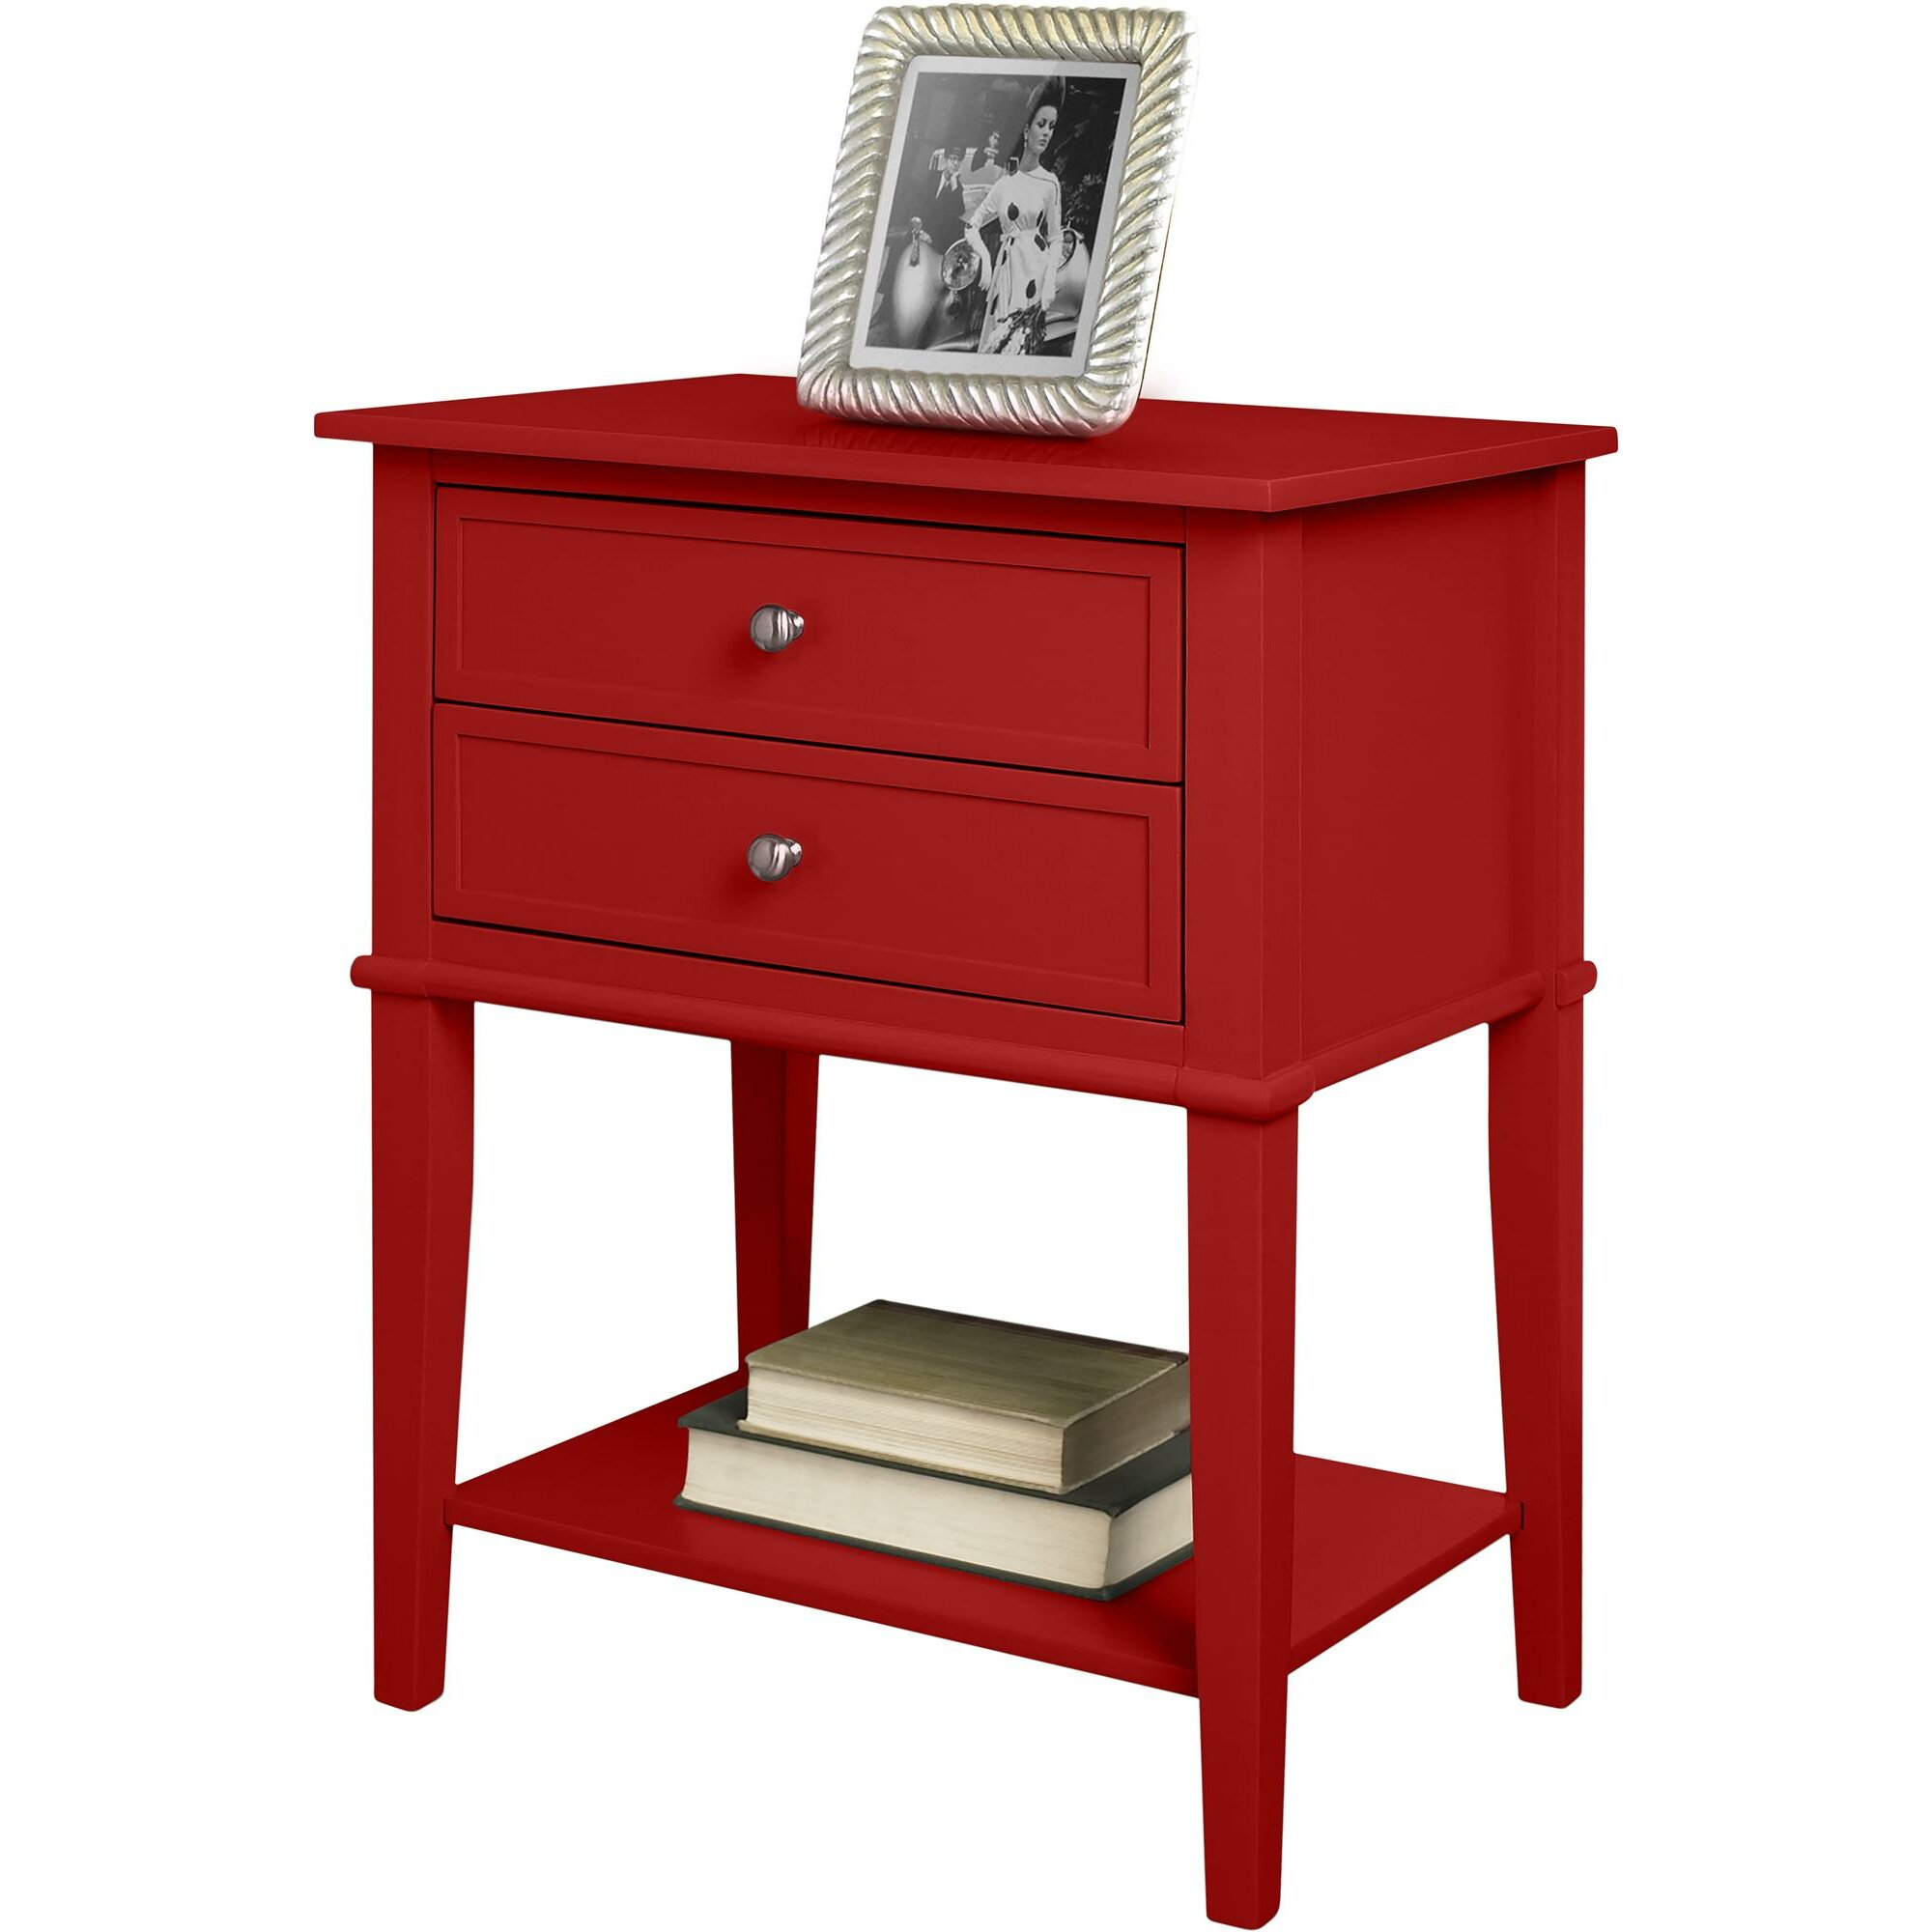 breakwater bay banbury 2 drawer end table reviews. Black Bedroom Furniture Sets. Home Design Ideas